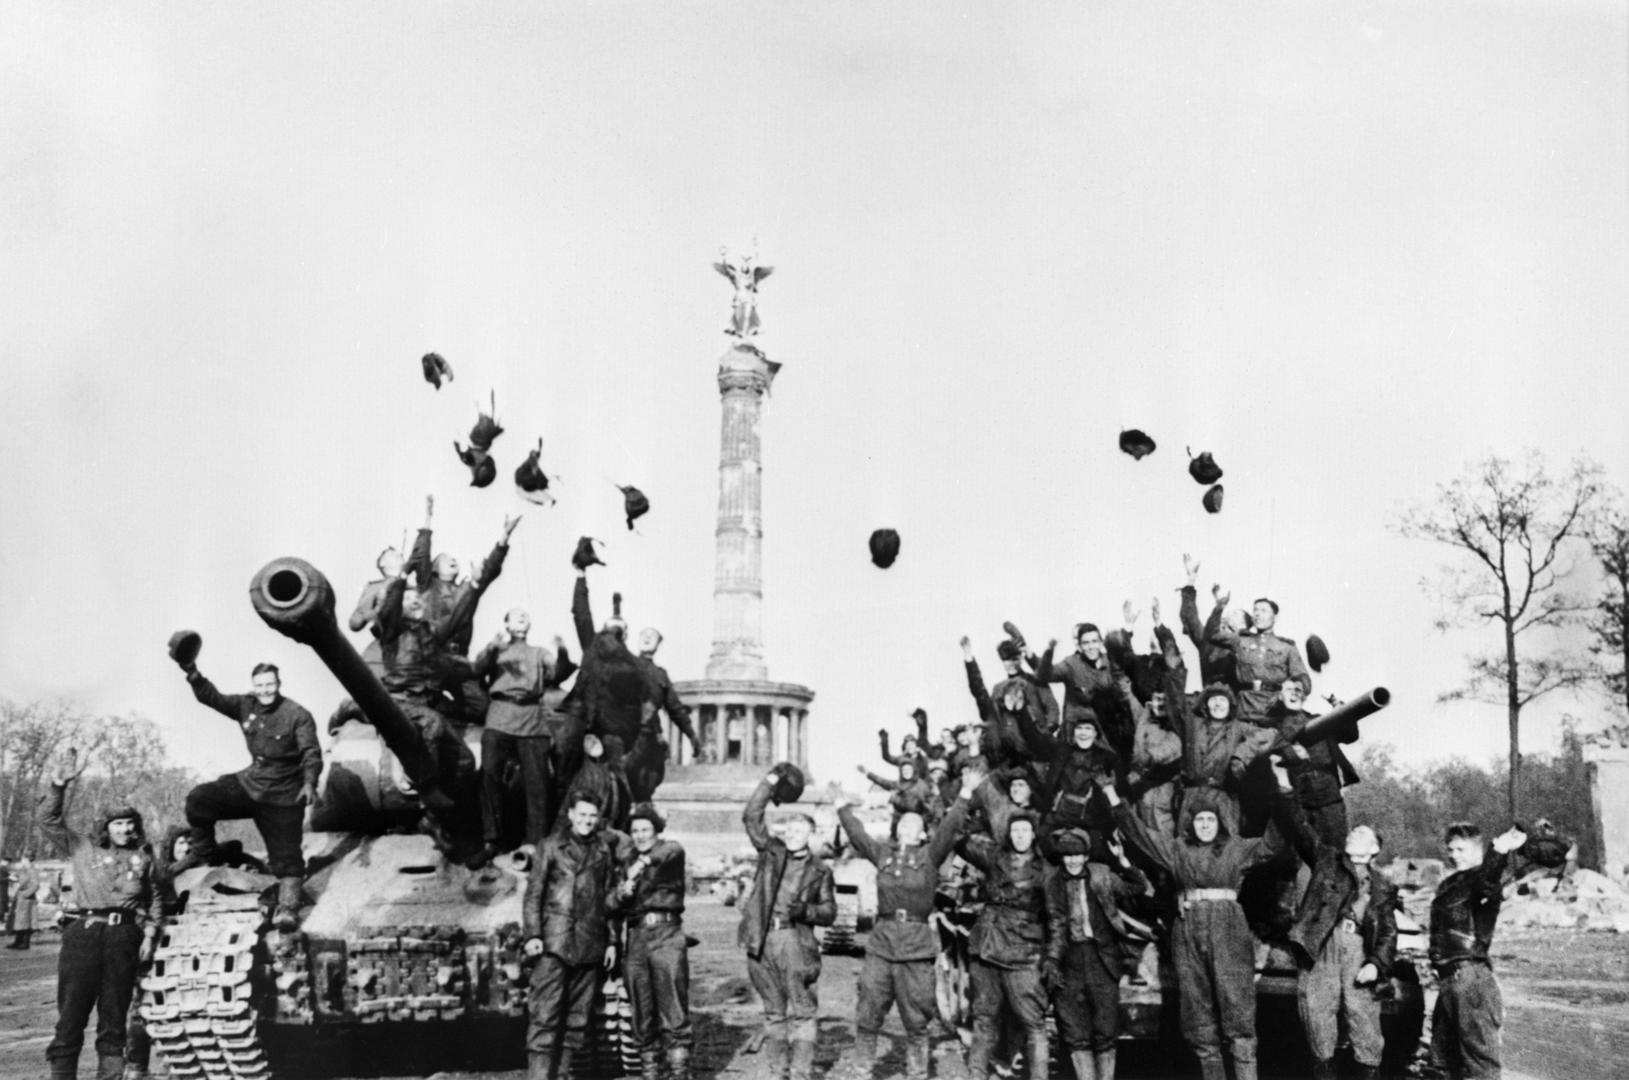 9. Mai 1945 in Berlin